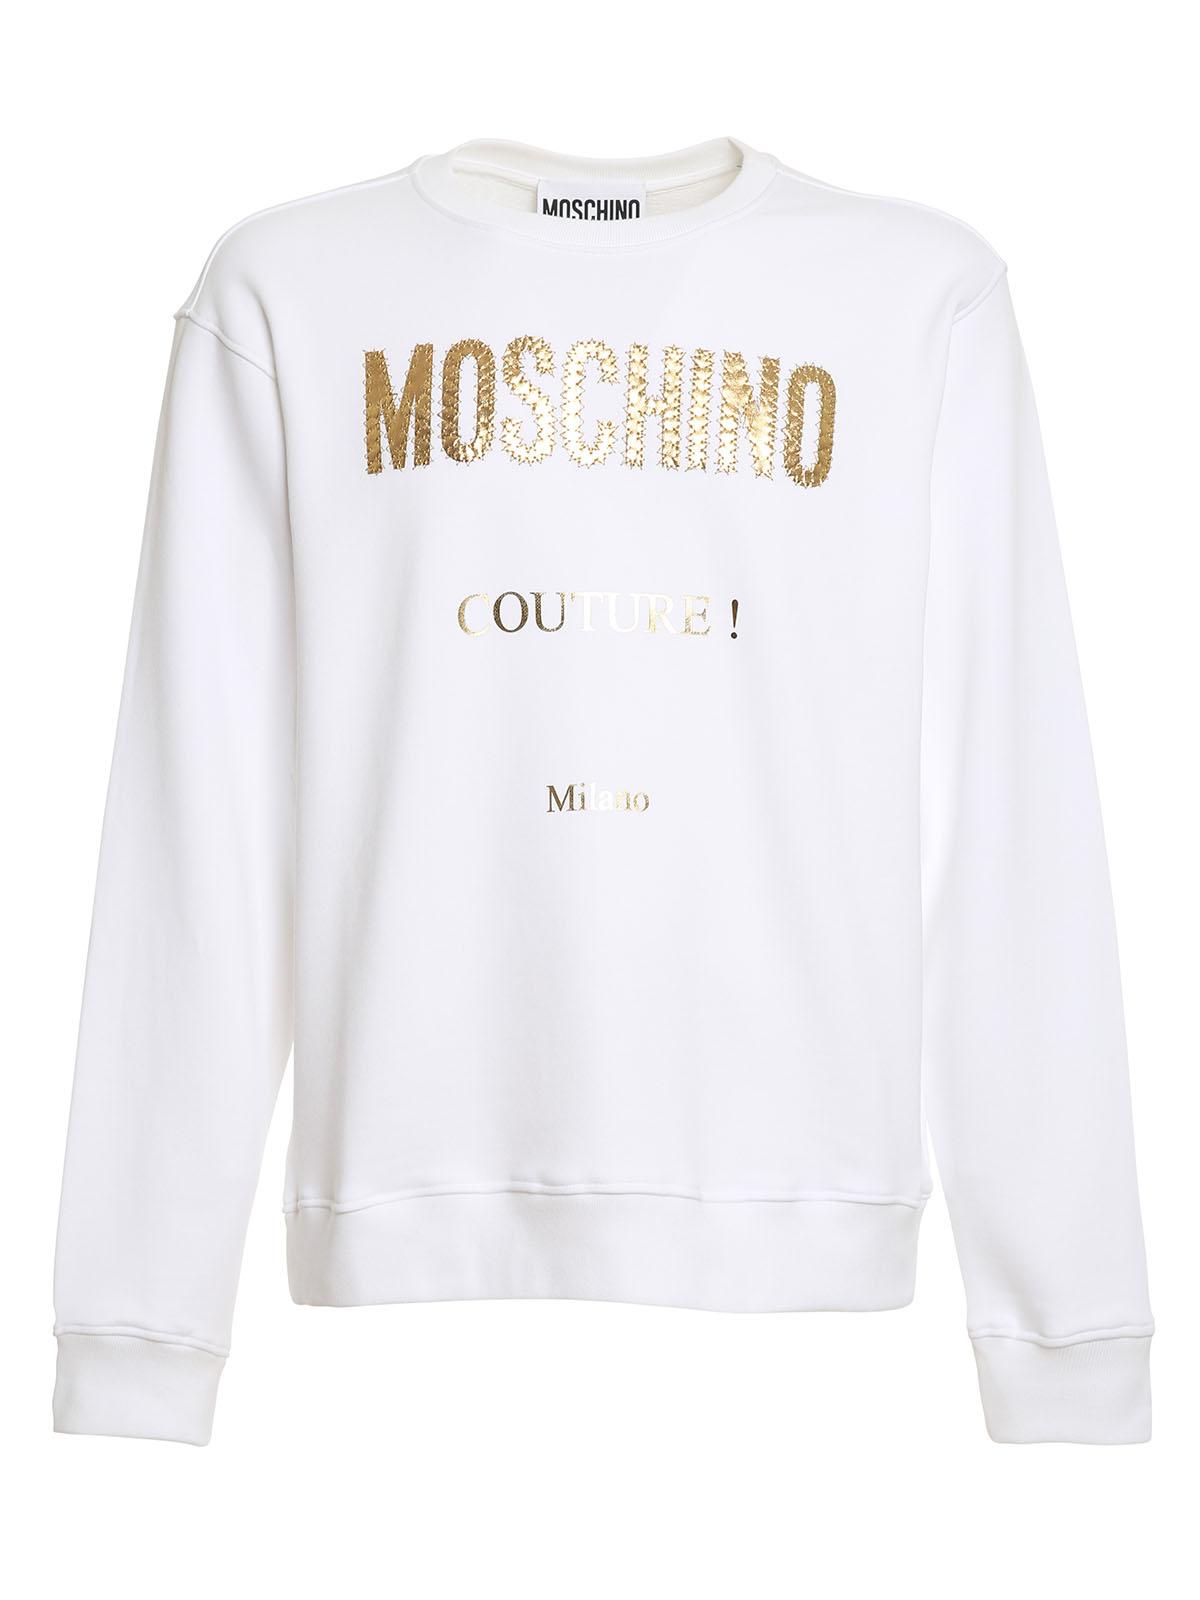 Moschino Cottons LAMINATED LOGO SWEATSHIRT